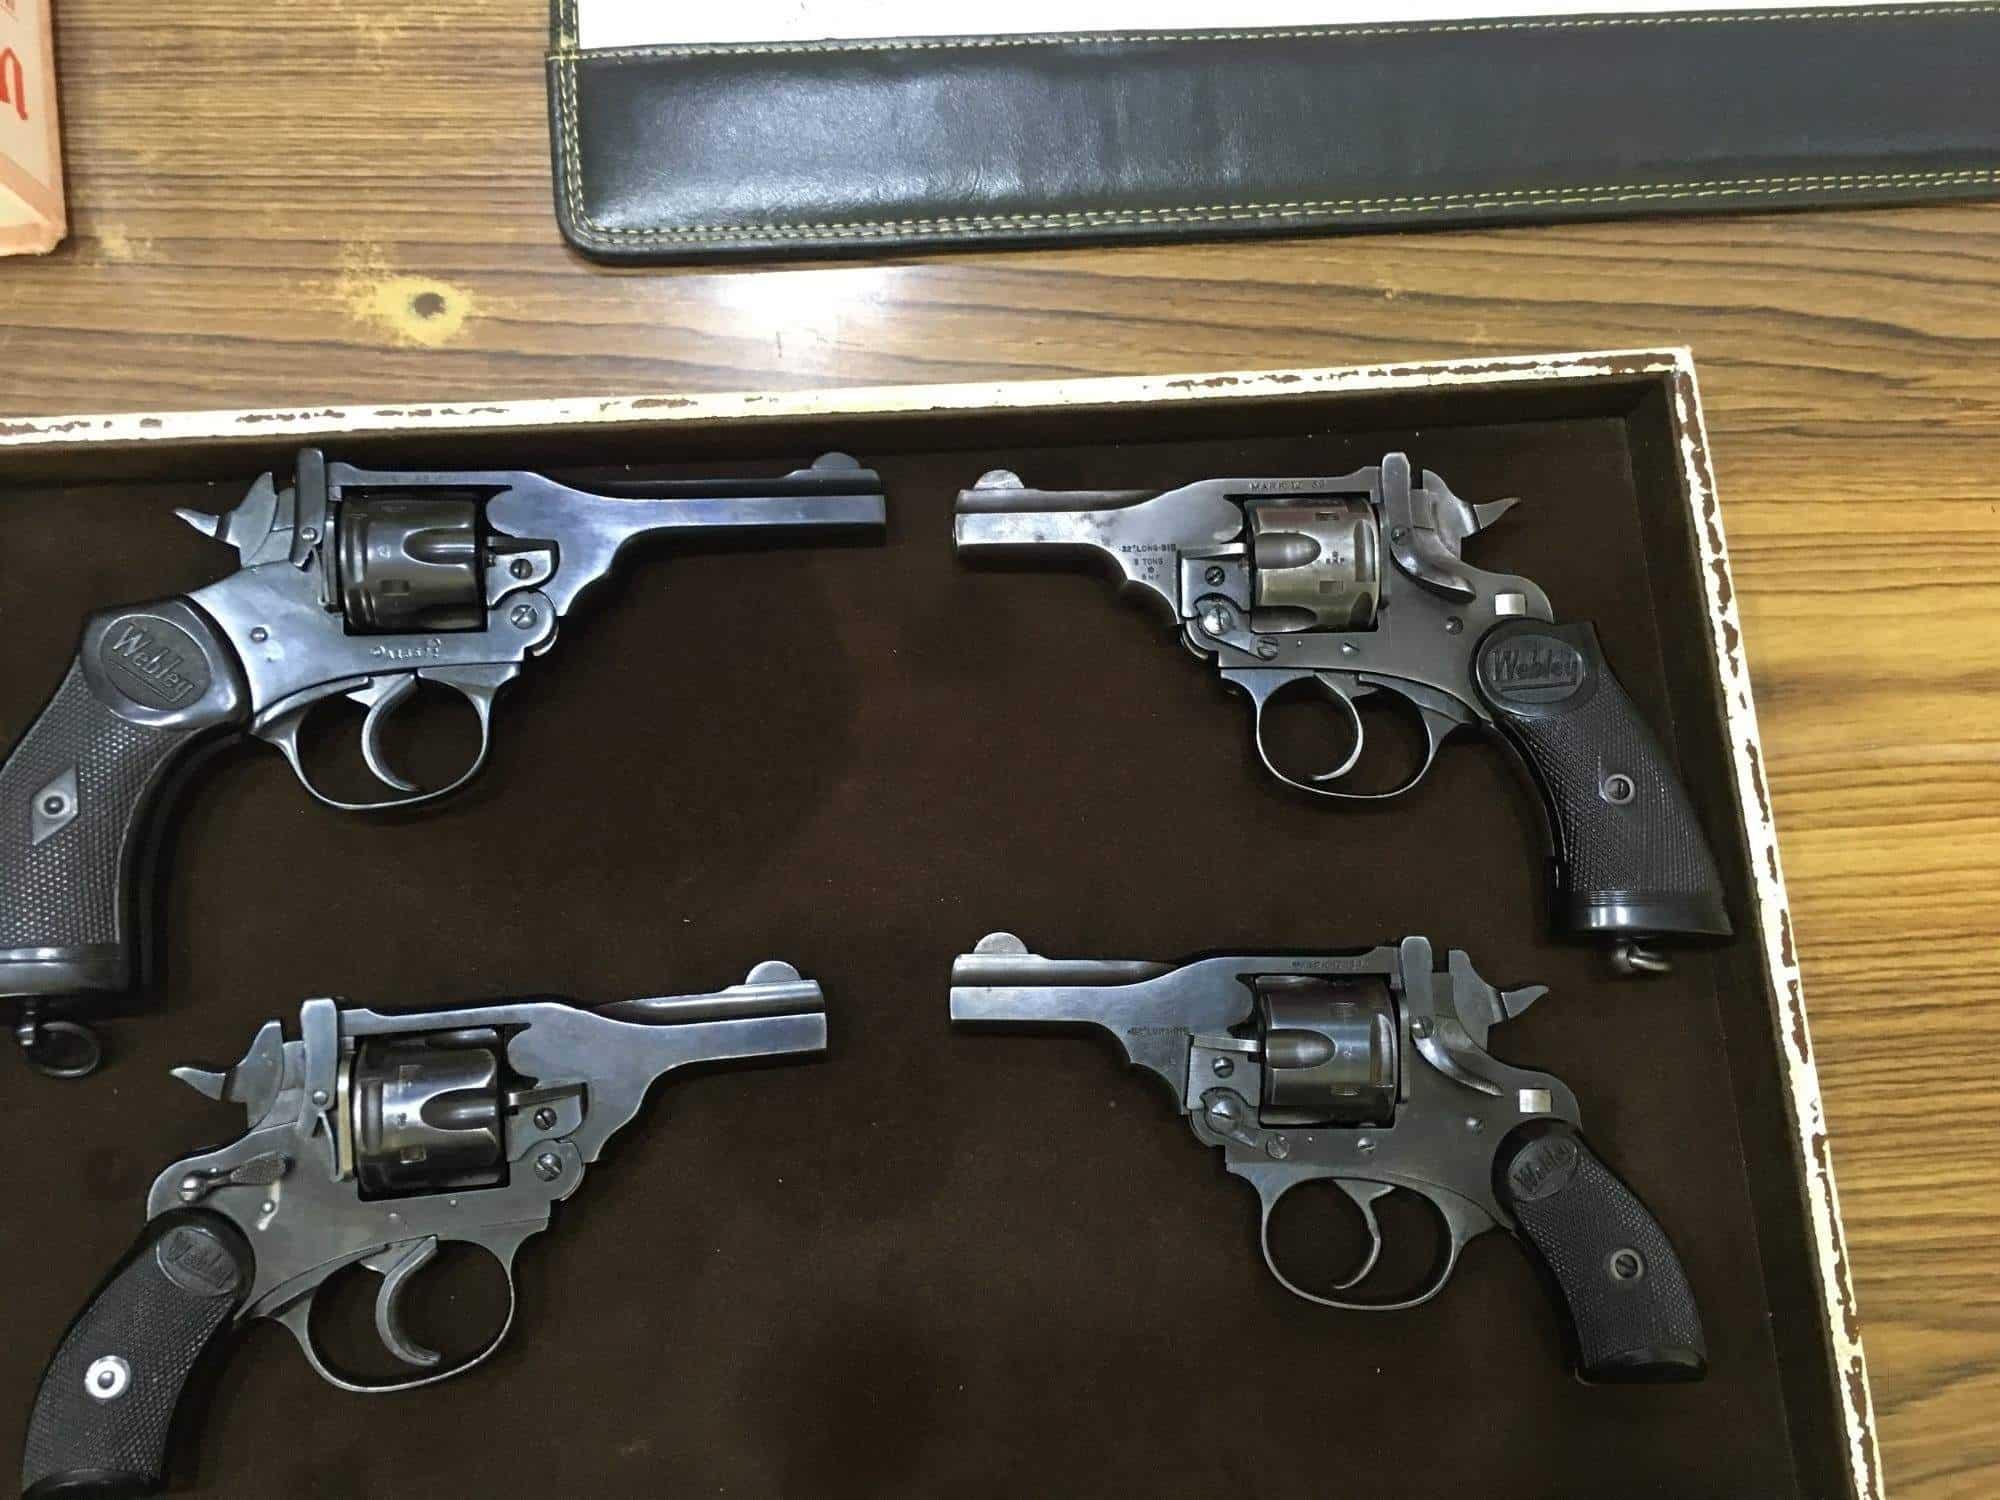 Ankit Gun House, Bali Nagar - Arms & Ammunition Dealers in